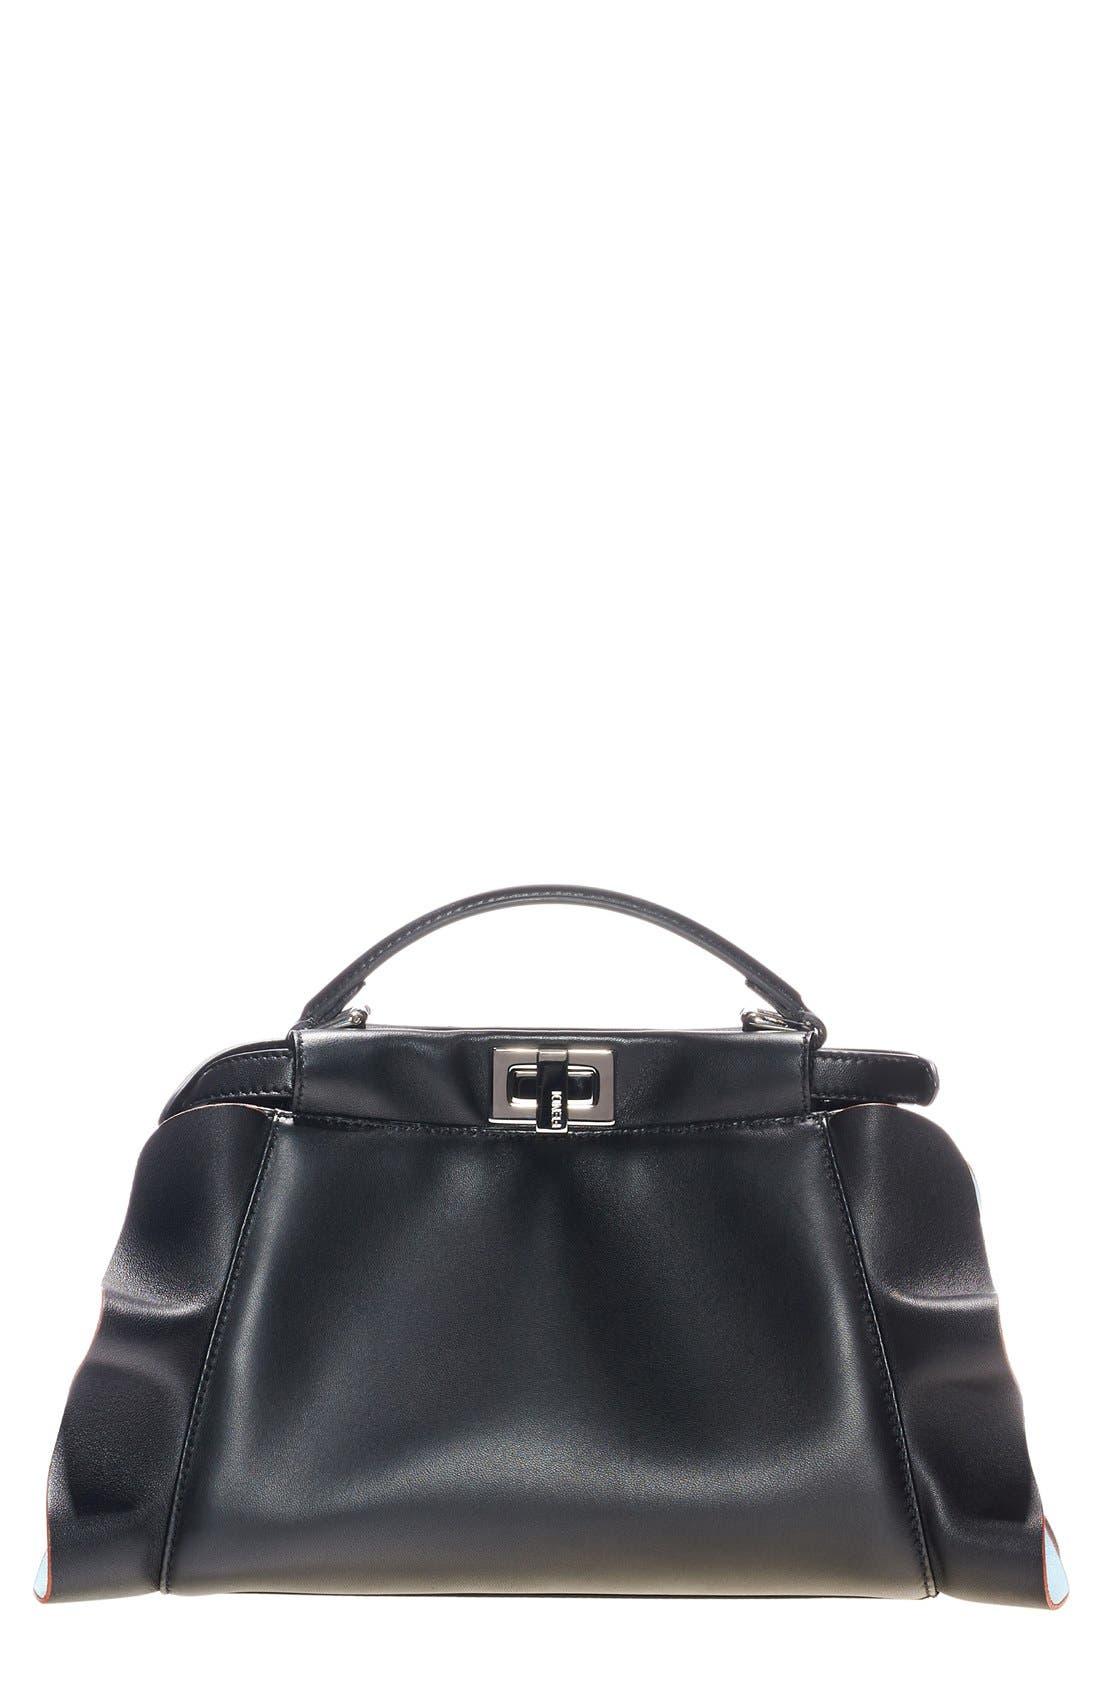 'Mini Peekaboo - Wave' Leather Bag,                             Main thumbnail 1, color,                             015